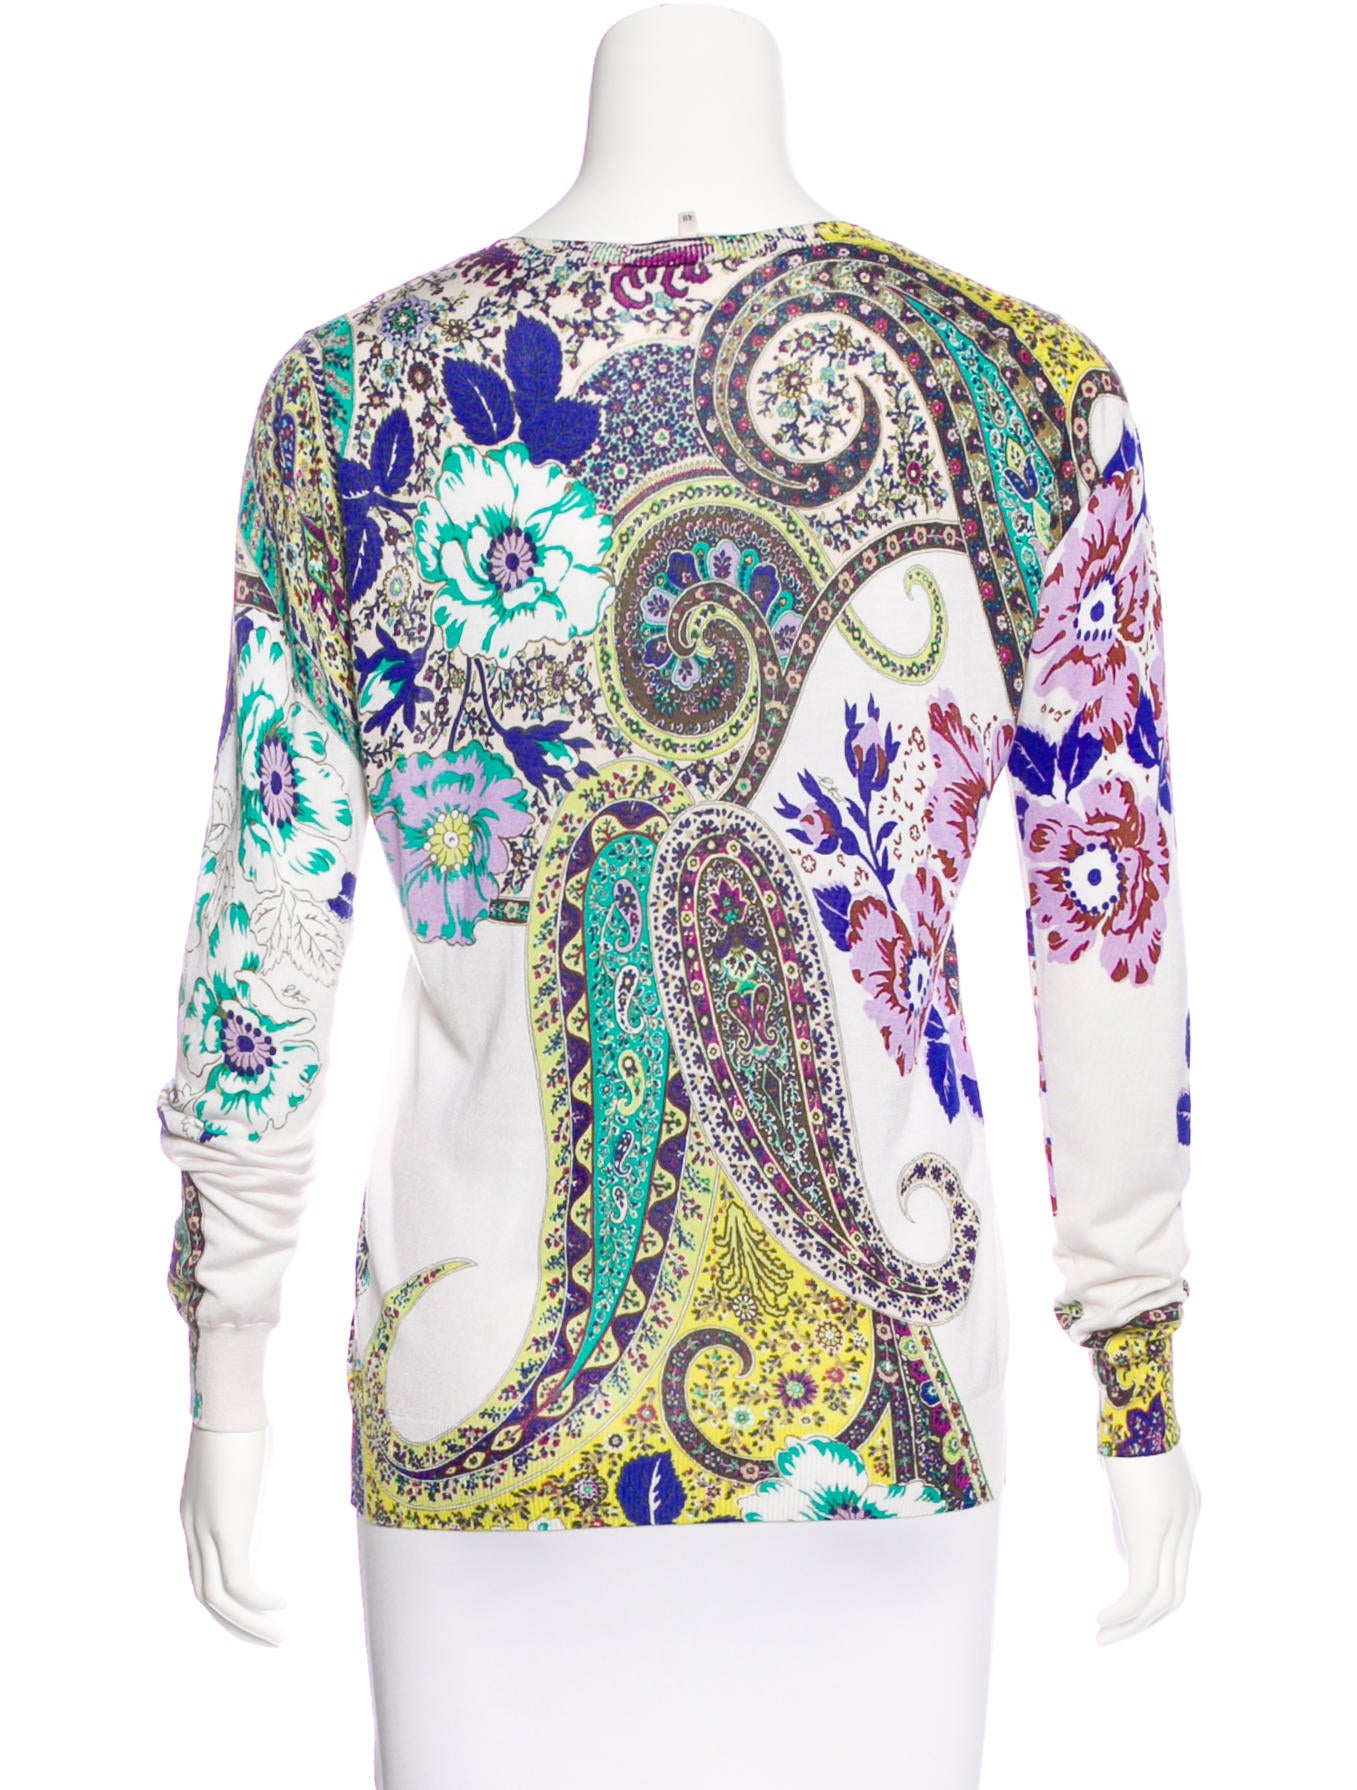 Etro Silk Paisley Print Sweater Clothing Etr48087